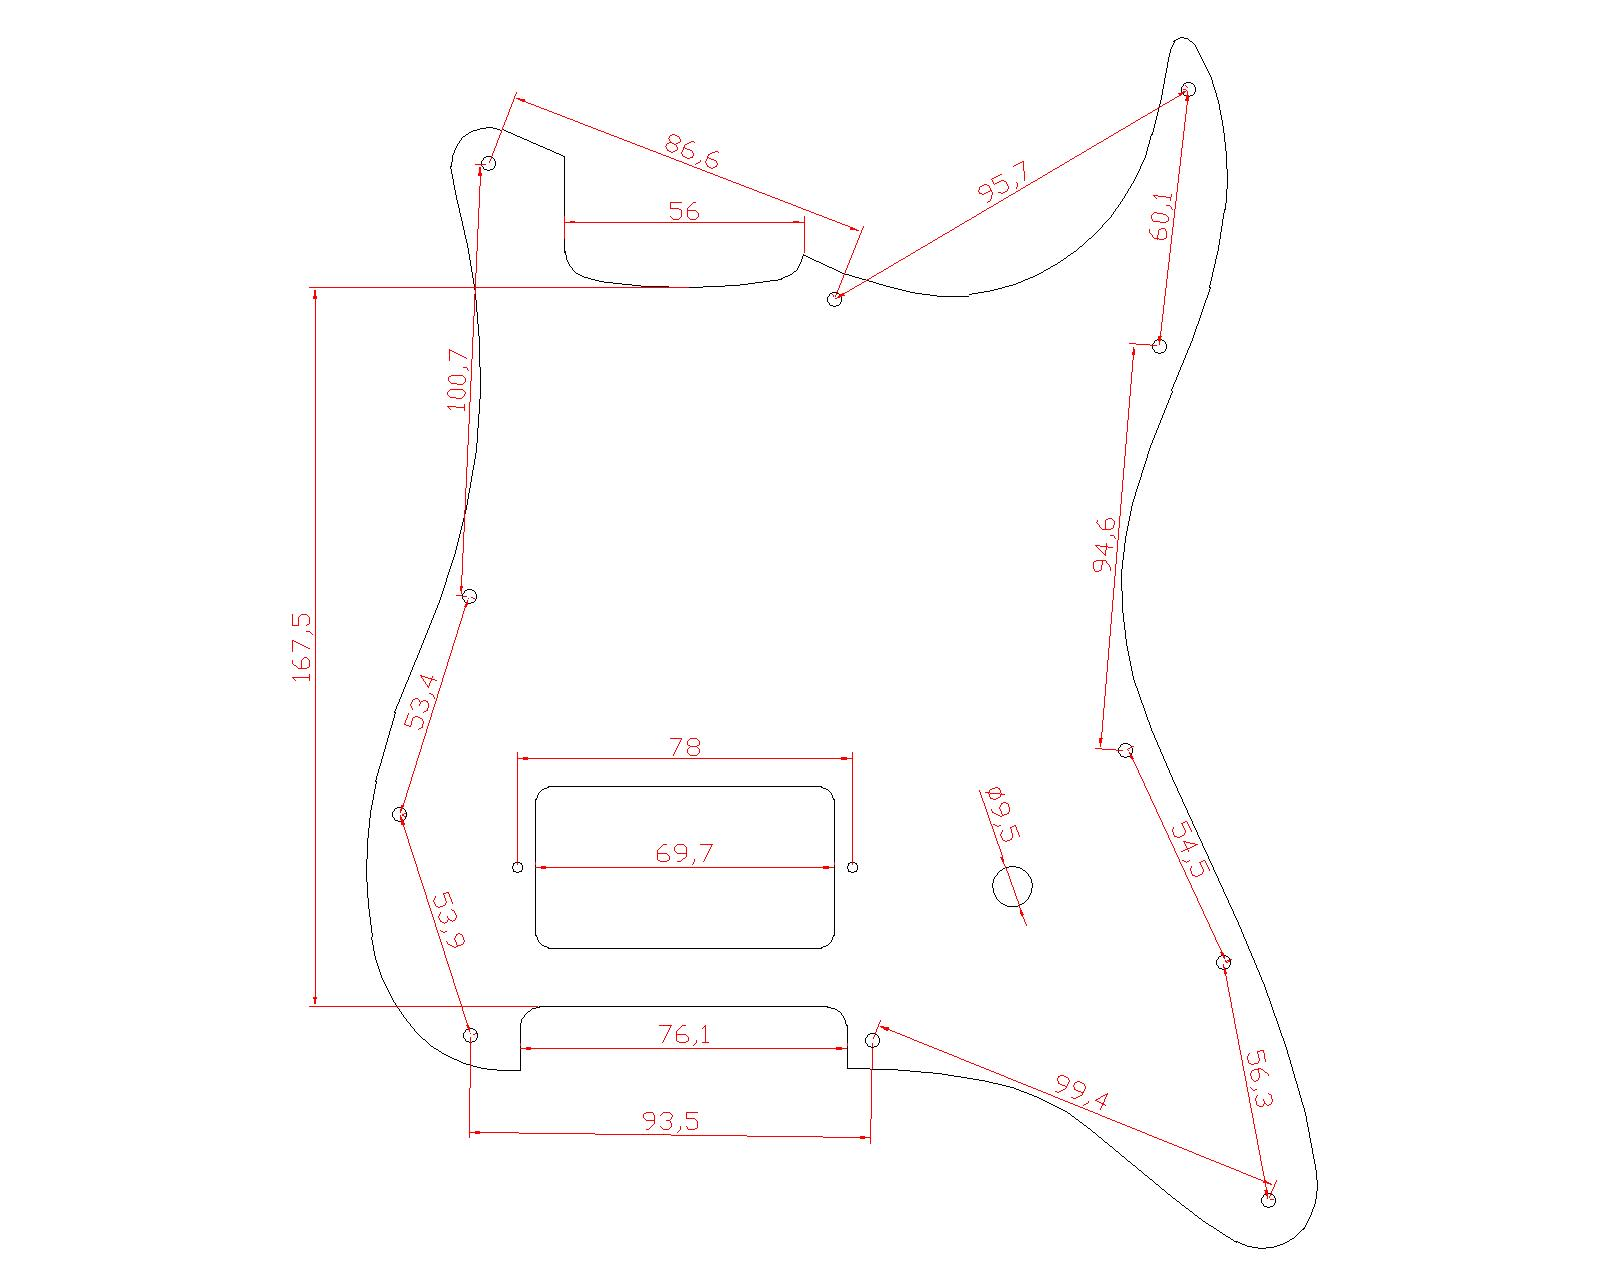 Dopro ST Strat One Humbucker Guitar Pickguard Scratch Plate Fend - Երաժշտական գործիքներ - Լուսանկար 2